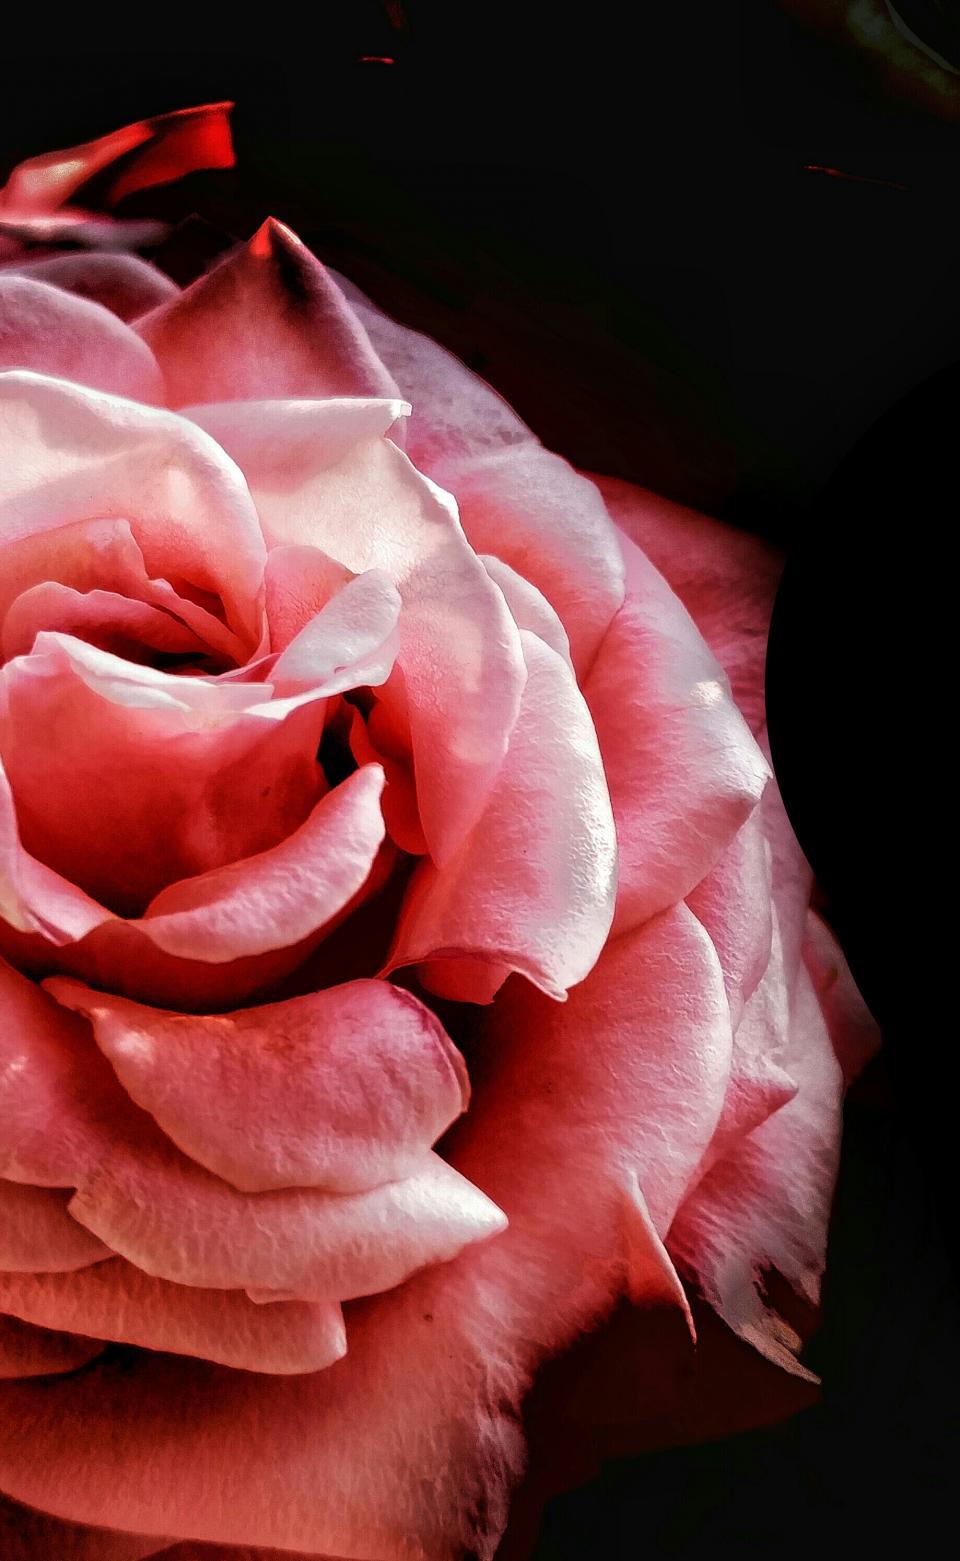 pink, flower, bloom, petal, roses, plant, nature, dark